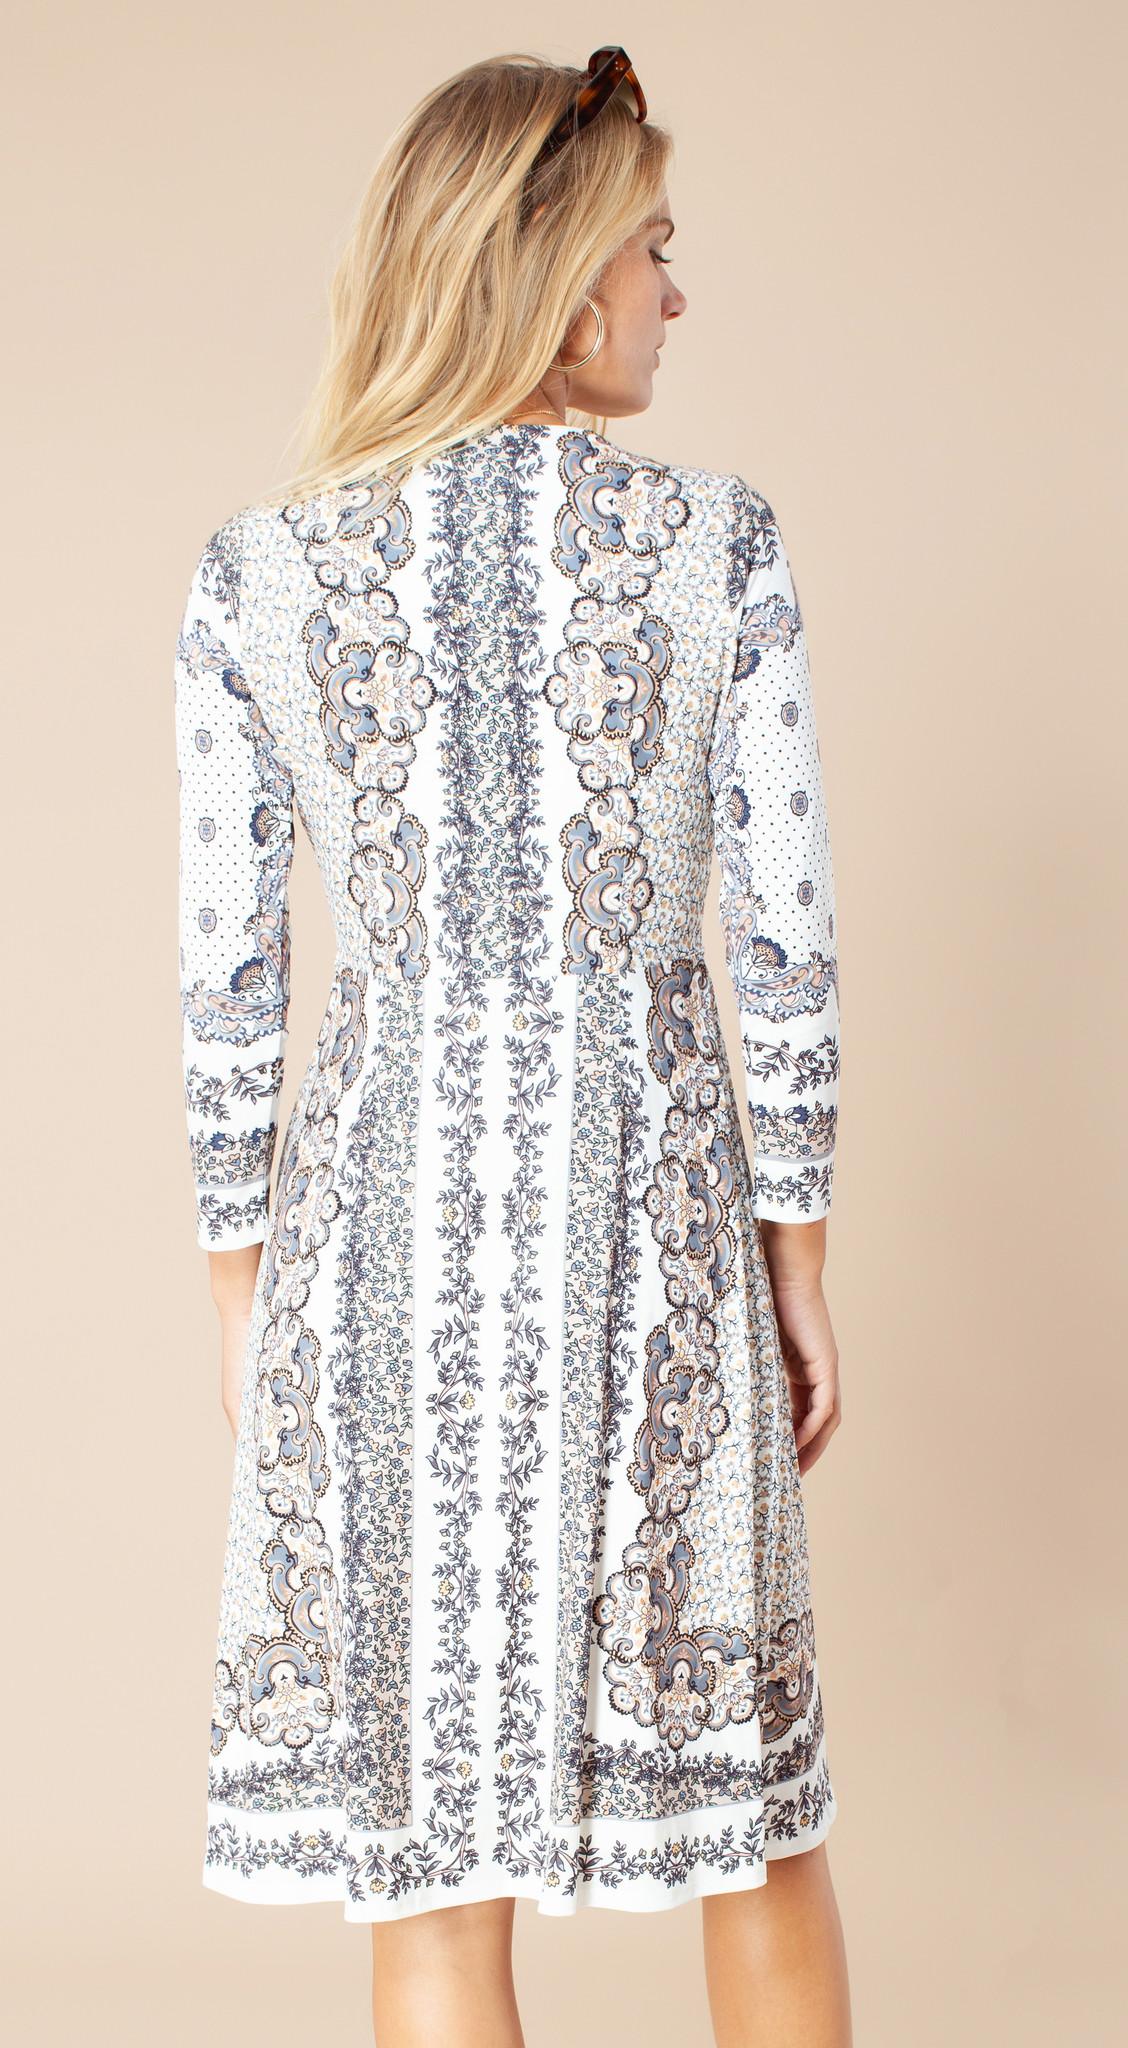 Hale Bob Joss Jersey Dress Ivory